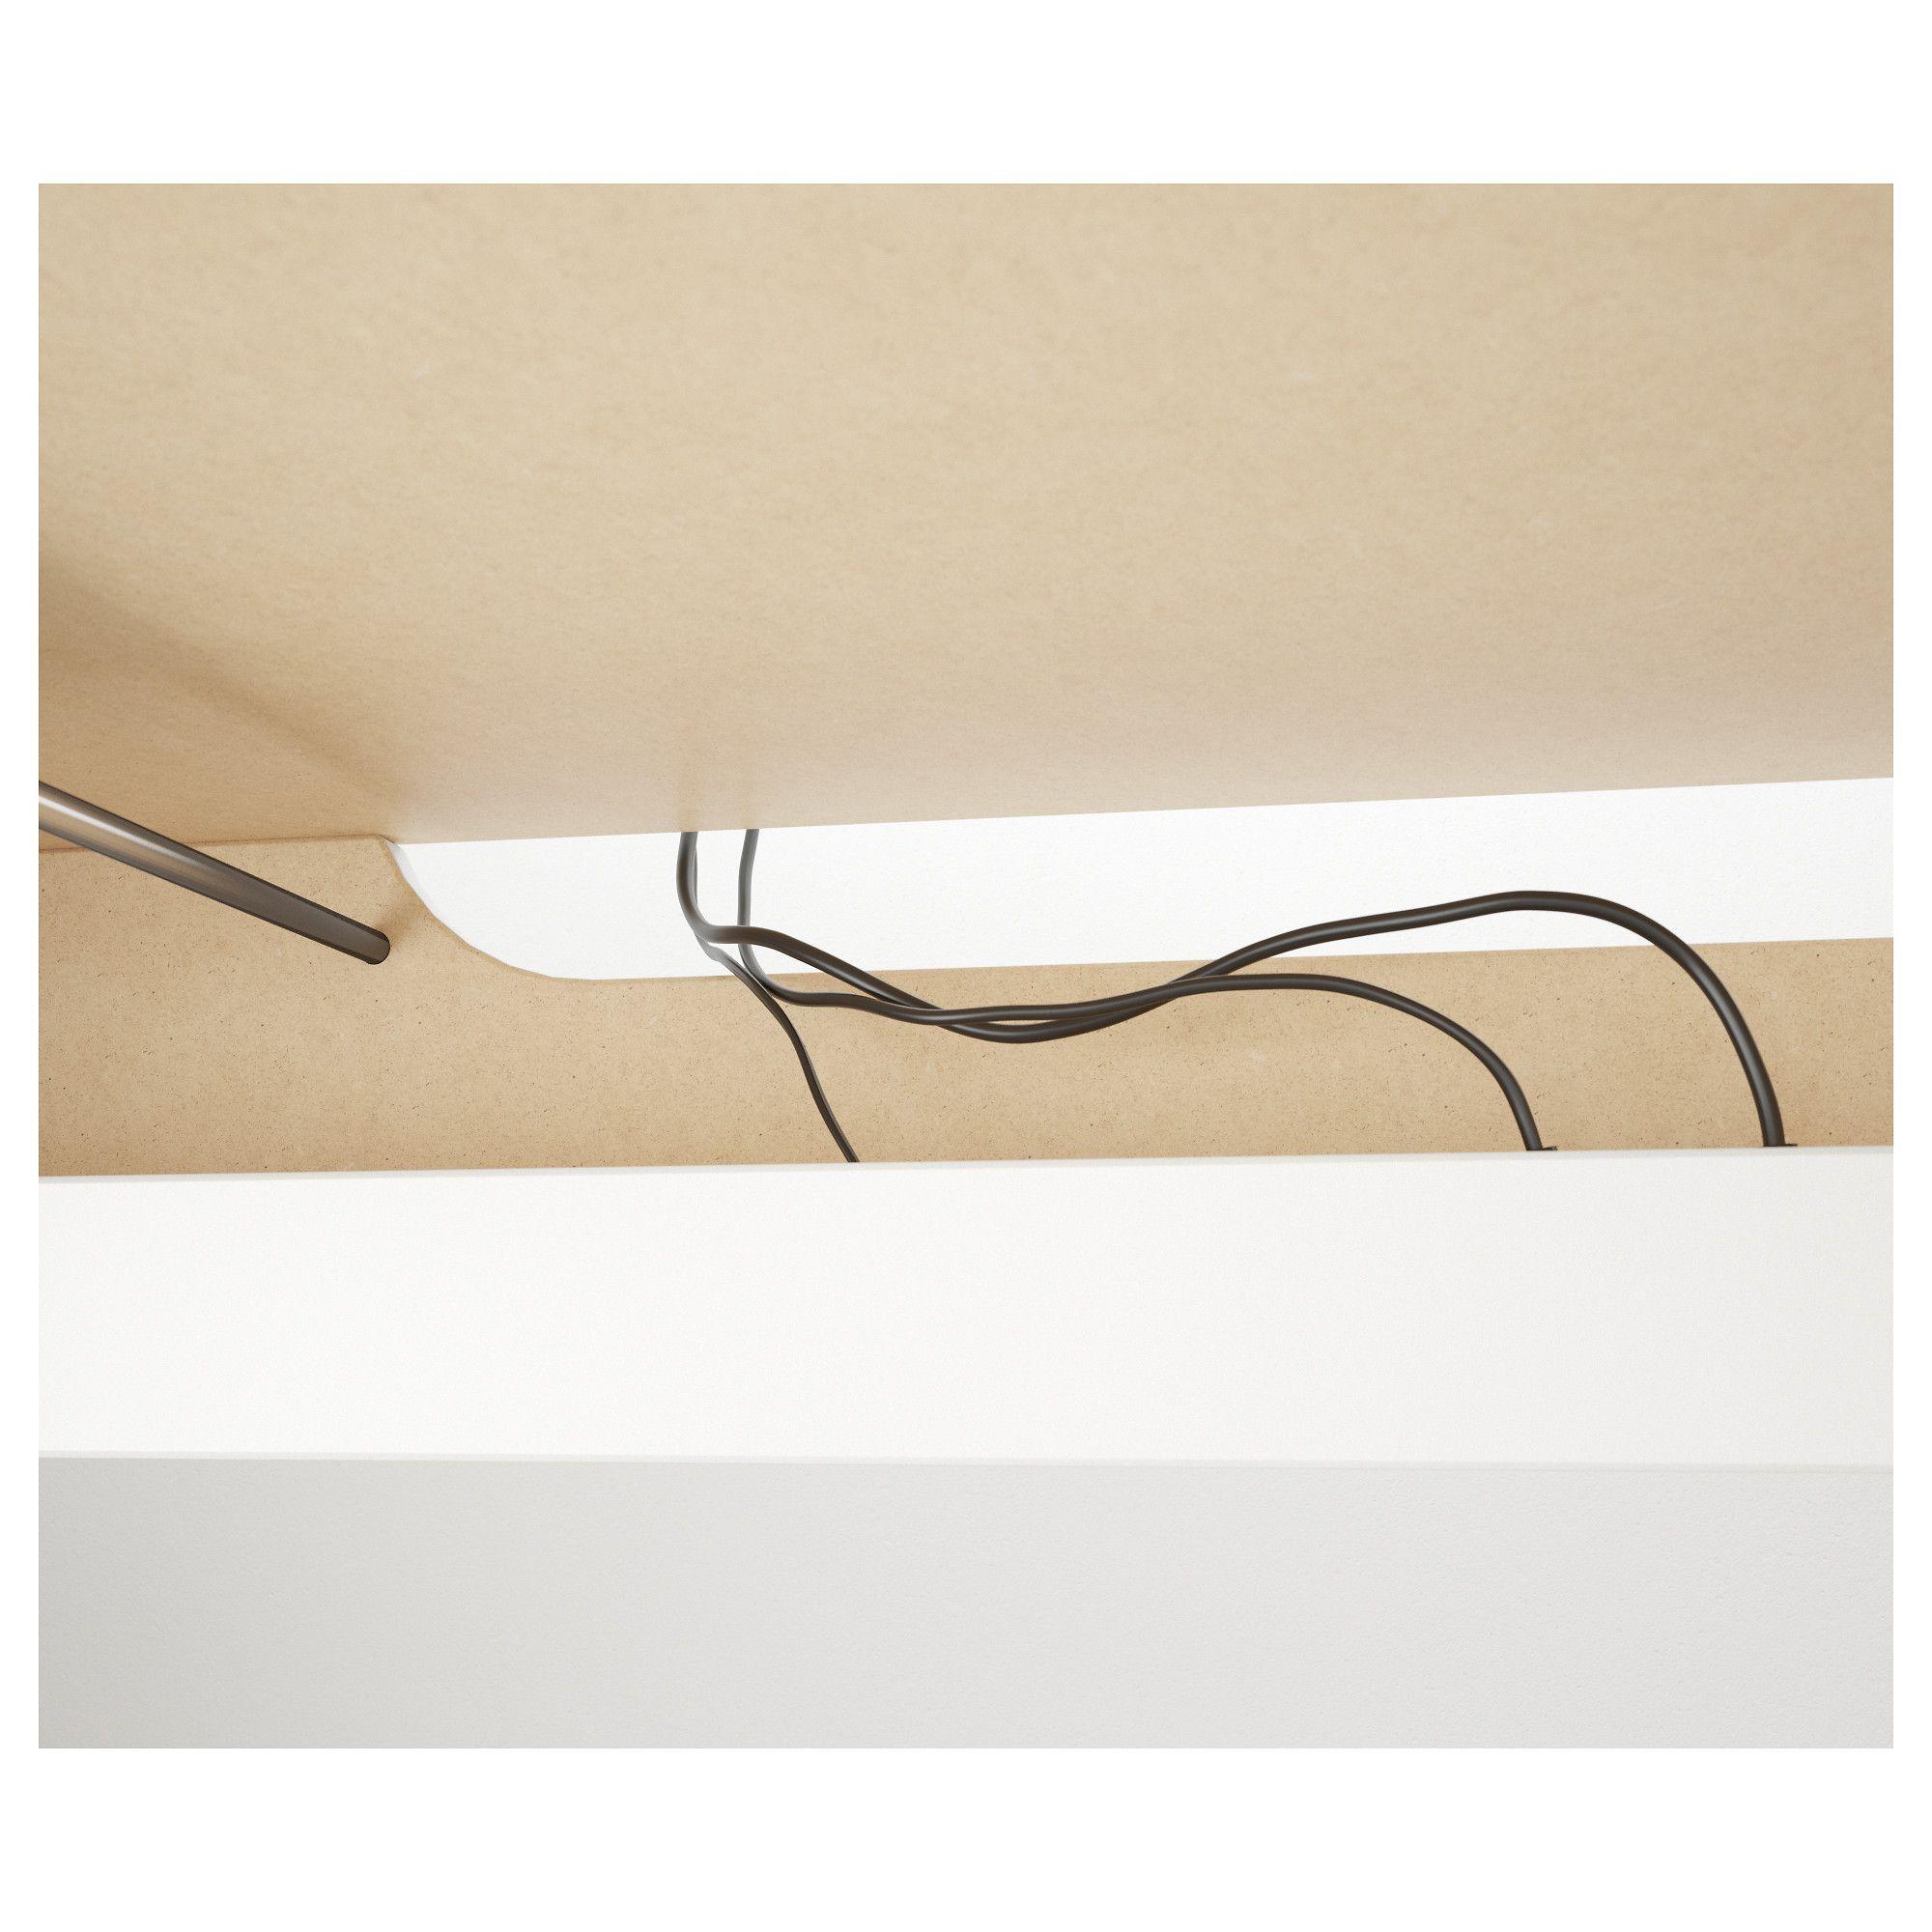 Signum Cable Management Horizontal Silver Color 27 Cable Management Cable Management Desk Ikea